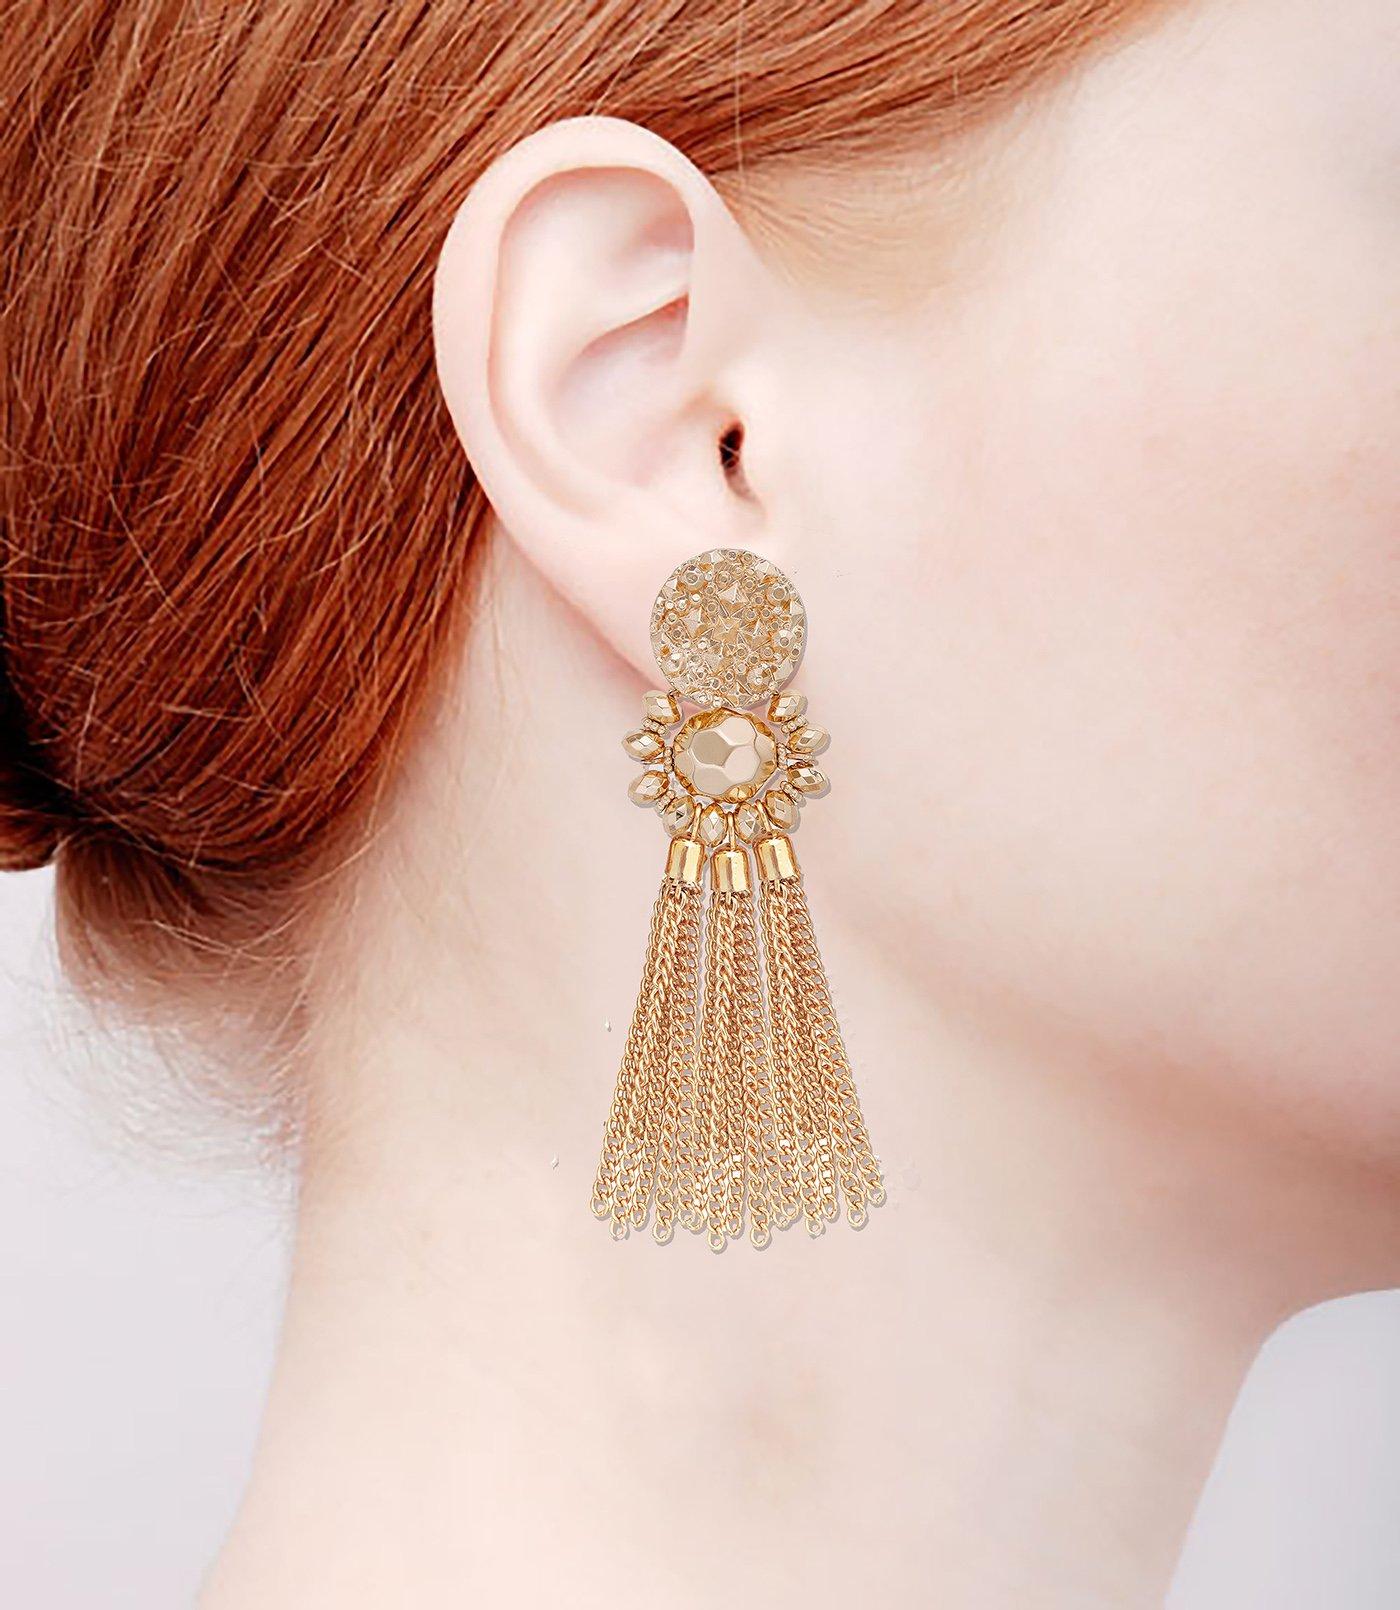 Bohemian Statement Tassel Chandelier Drop Dangle Earrings with Cassandra Button Stud (gold) by LPON (Image #7)